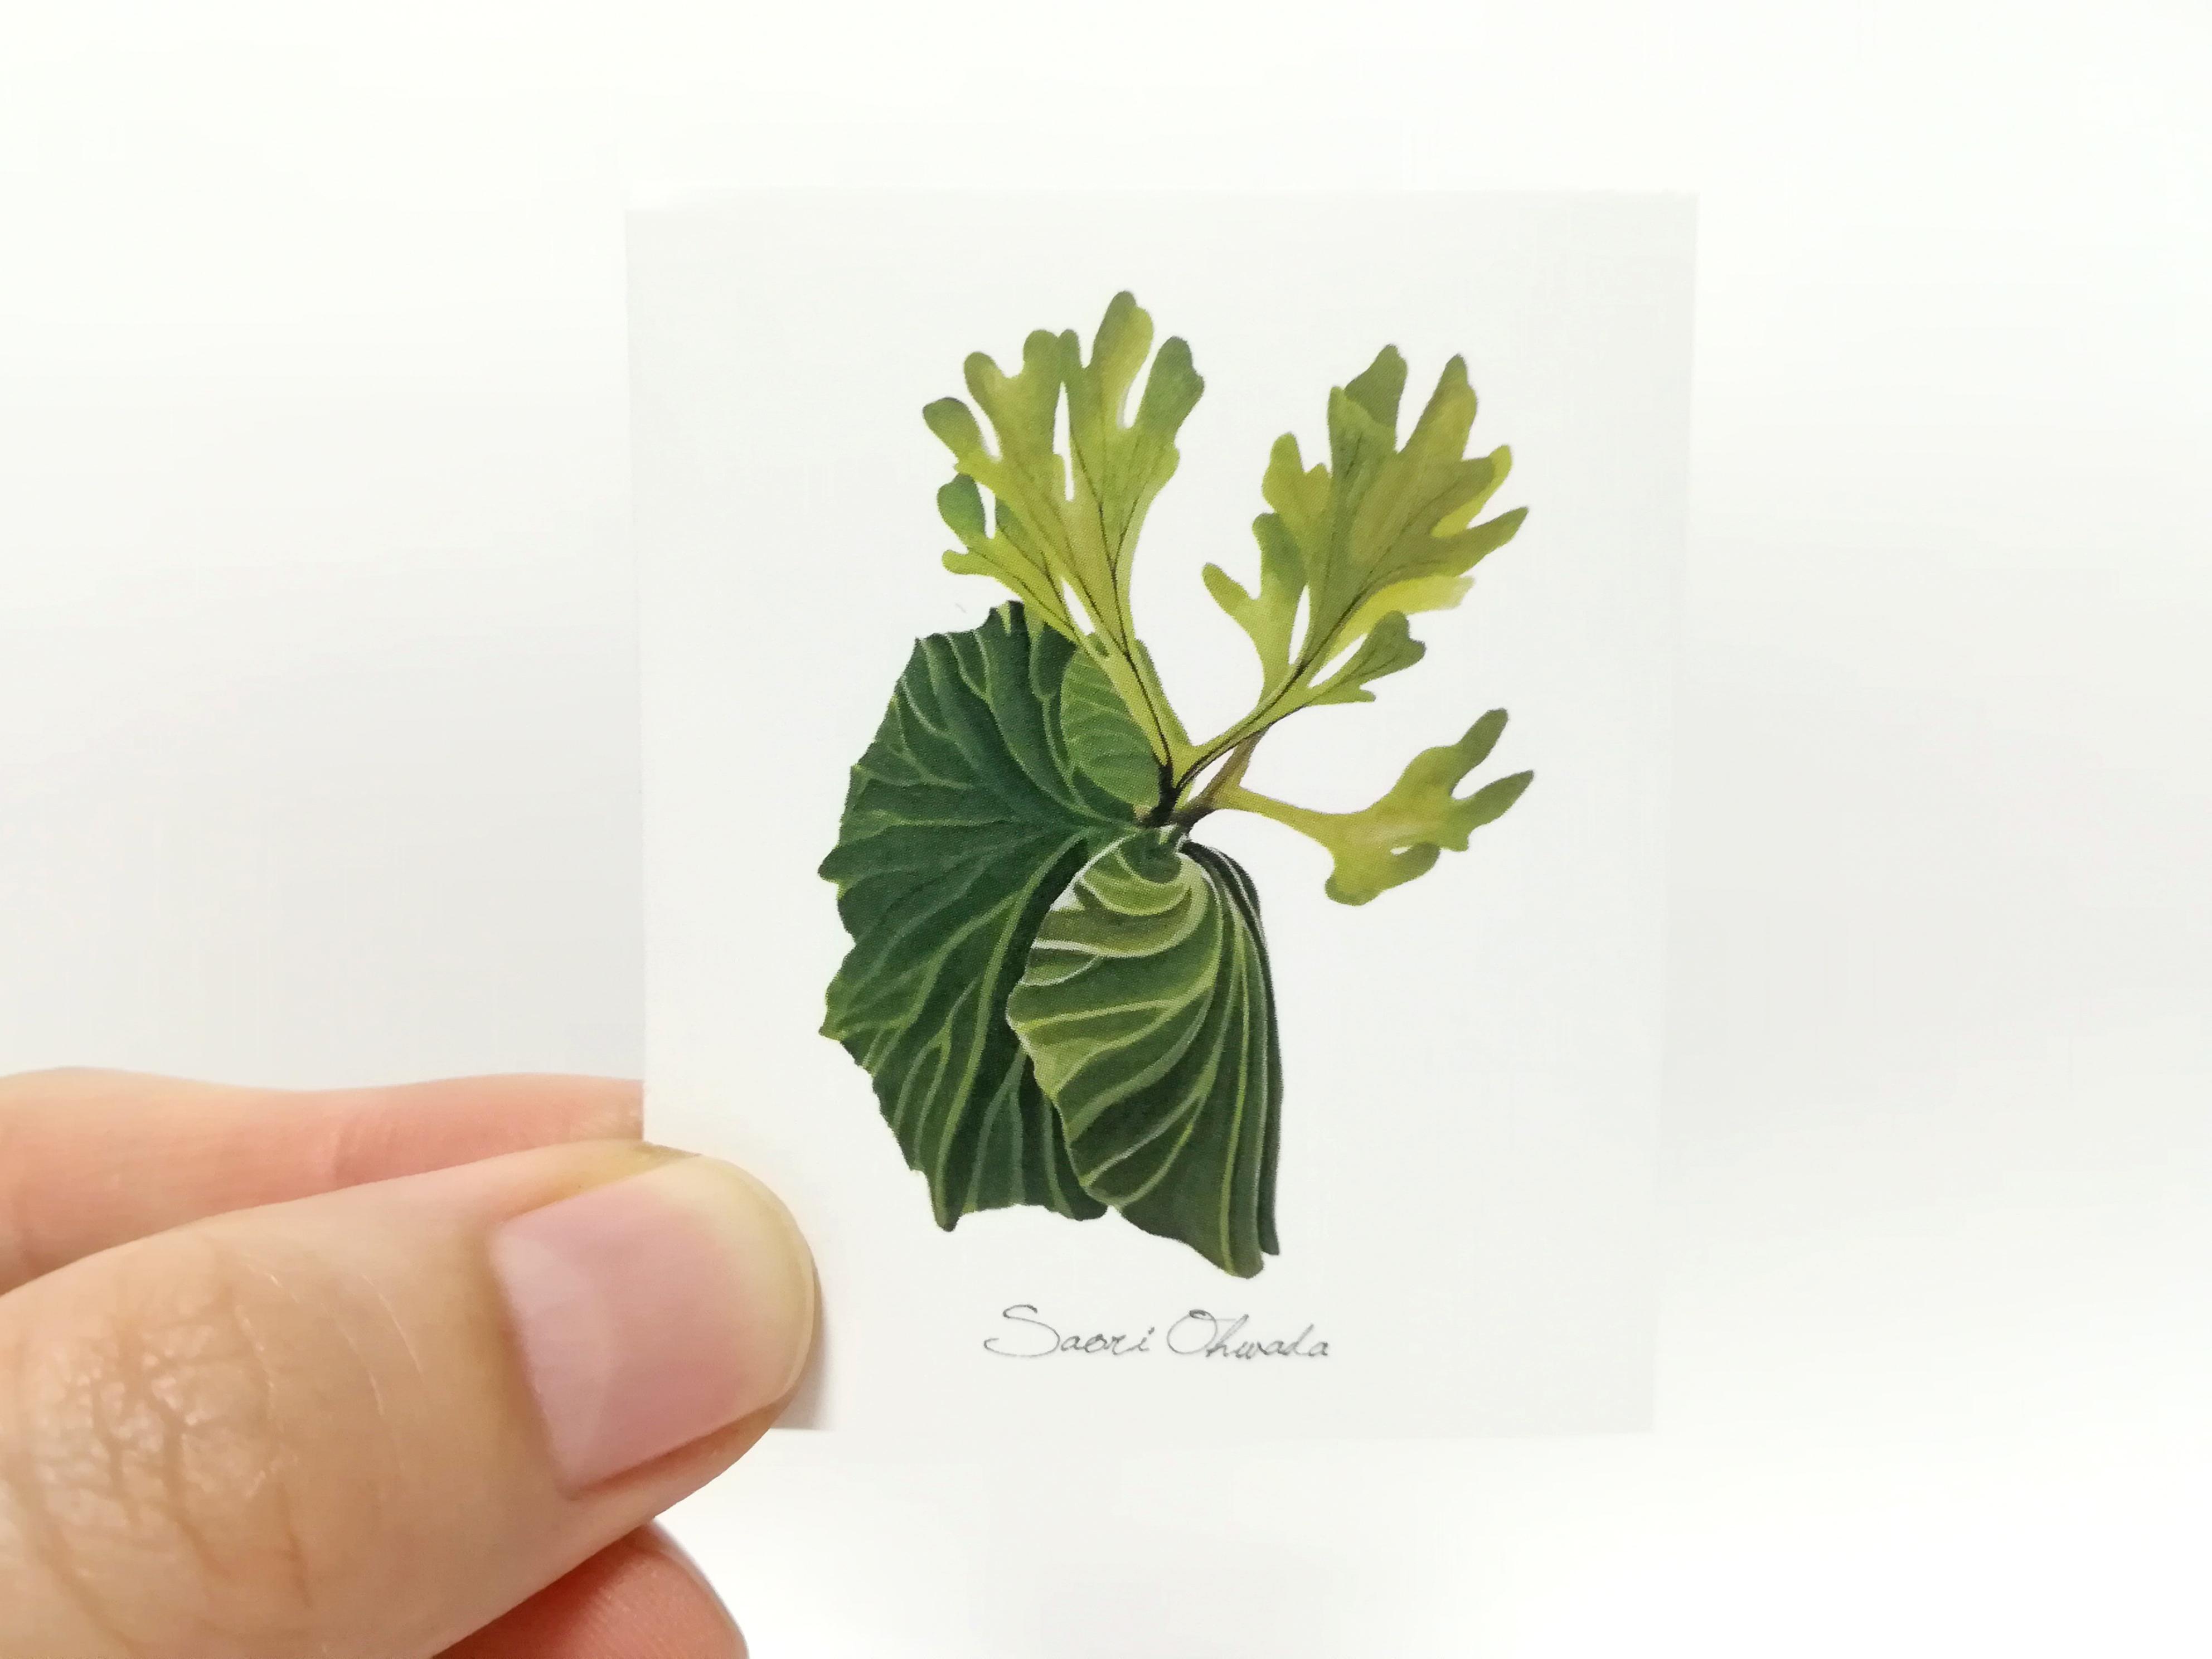 Platycerium ridleyi ステッカー